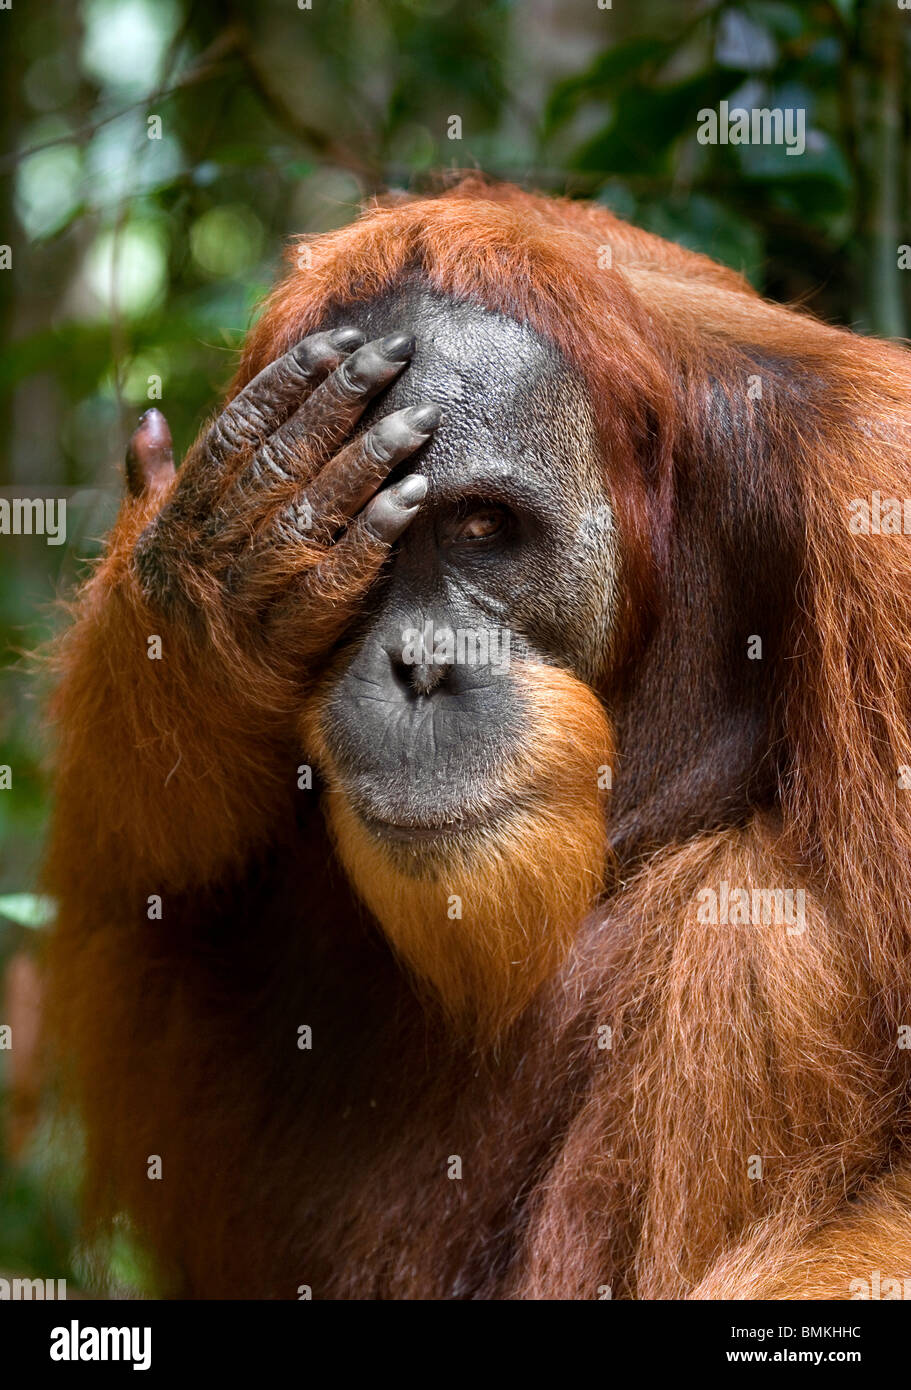 Les jeunes orang-outan, parc national de Gunung Leuser, Sumatra, Indonésie. Banque D'Images